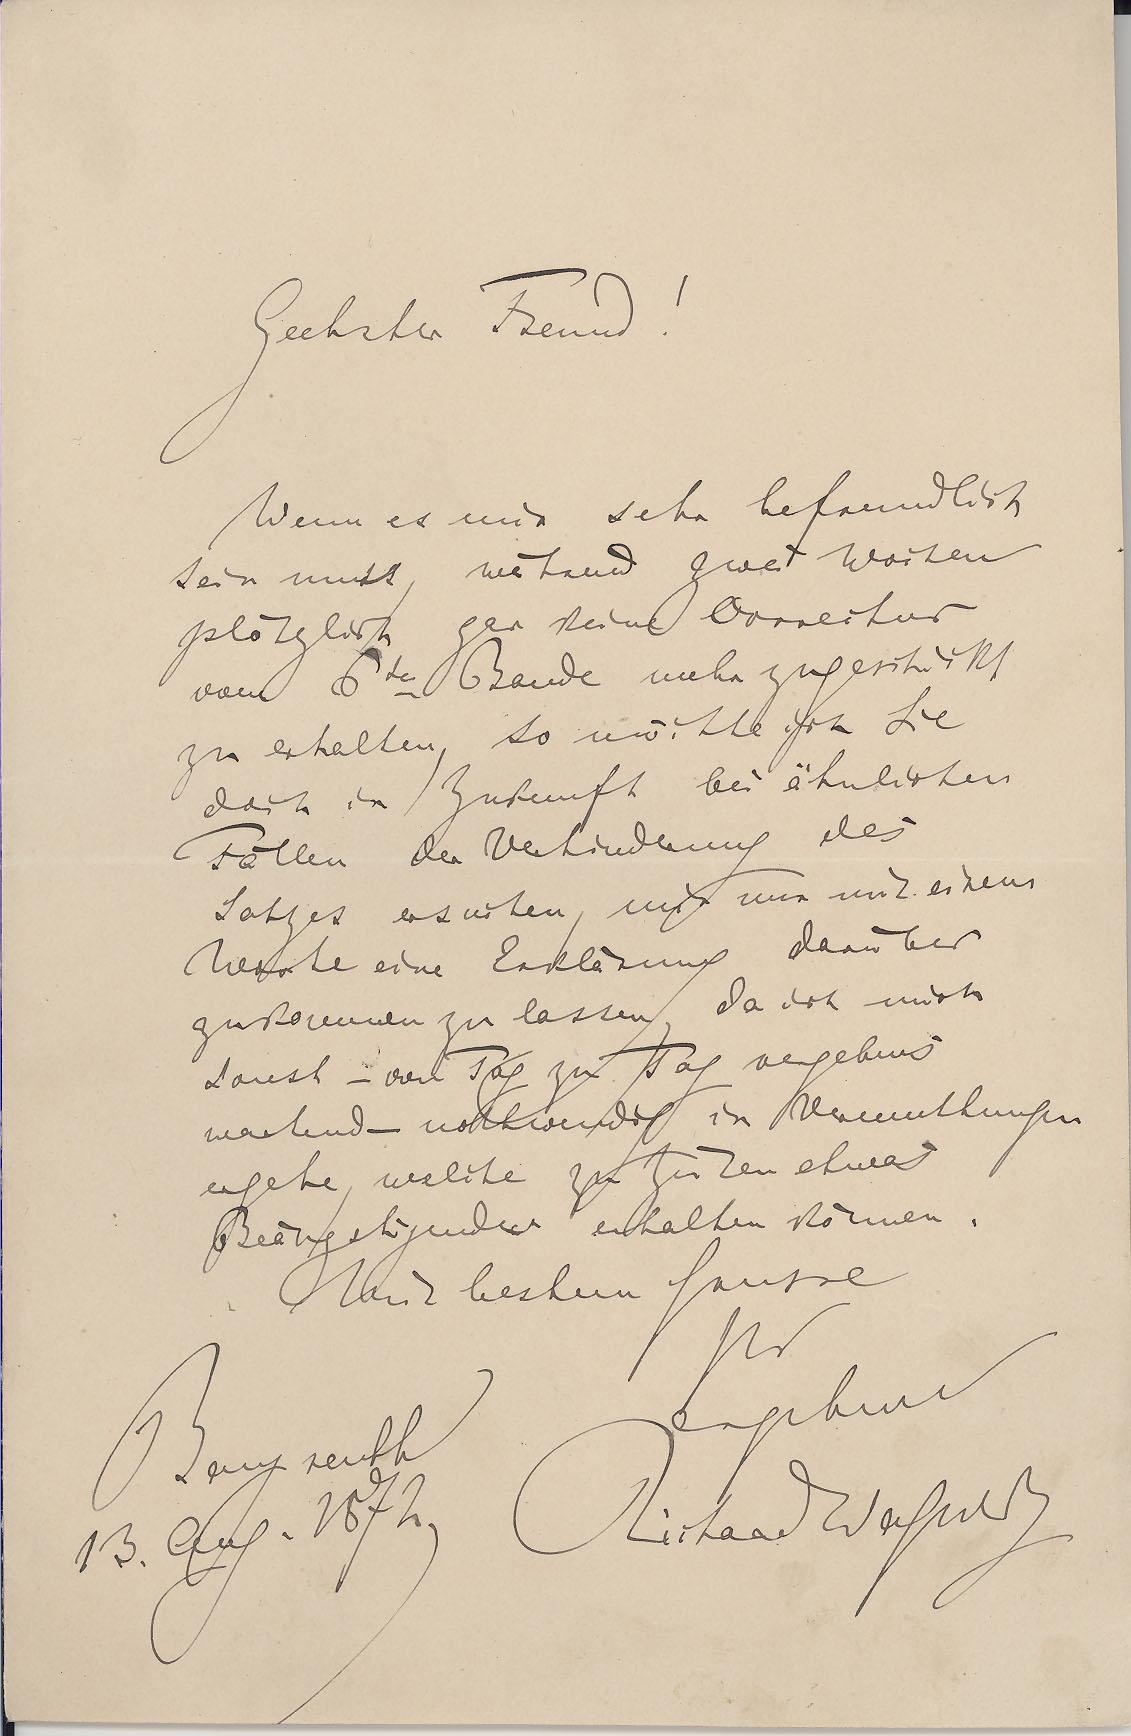 Richard Wagner, 1872. MS Thr 519, 2008TW-1027(1)